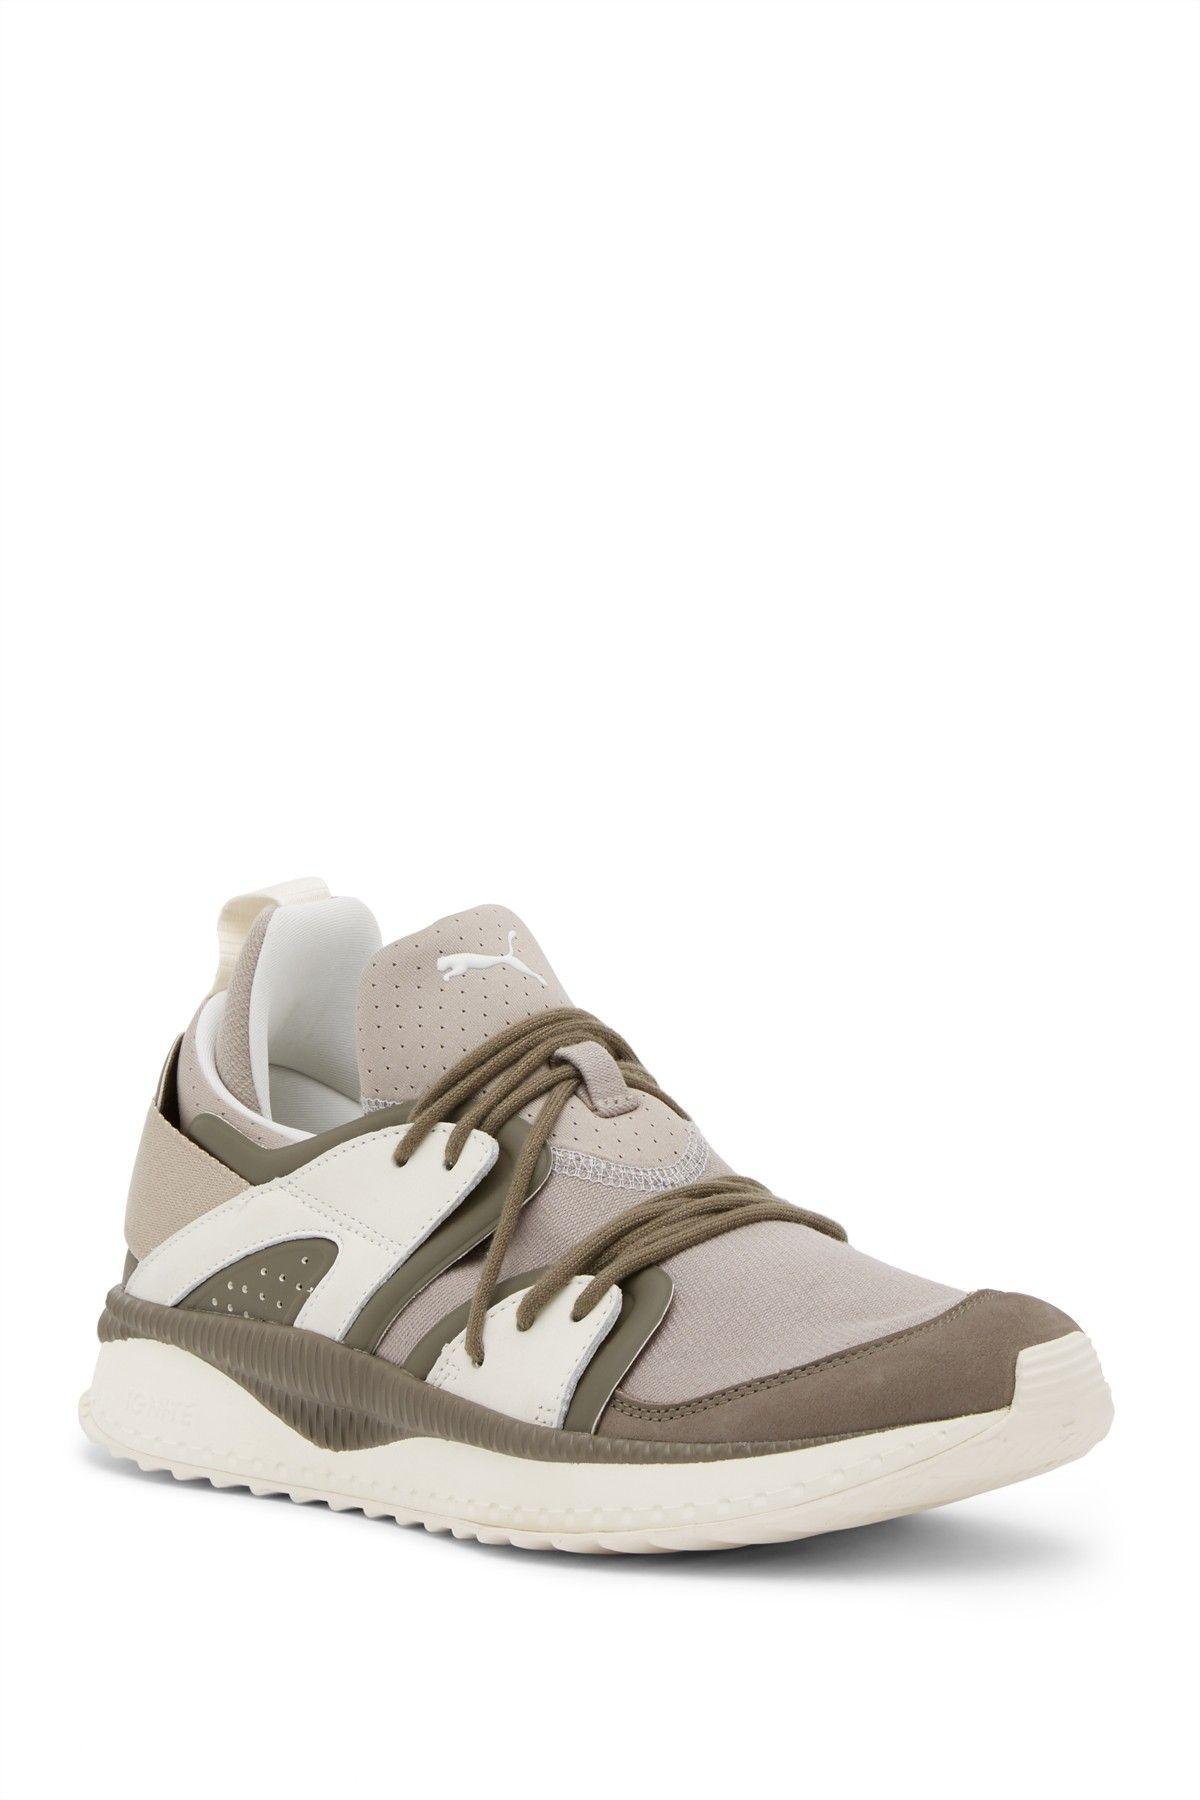 f732de246c2c Puma Tsugi Blaze Hyper Athletic Sneaker